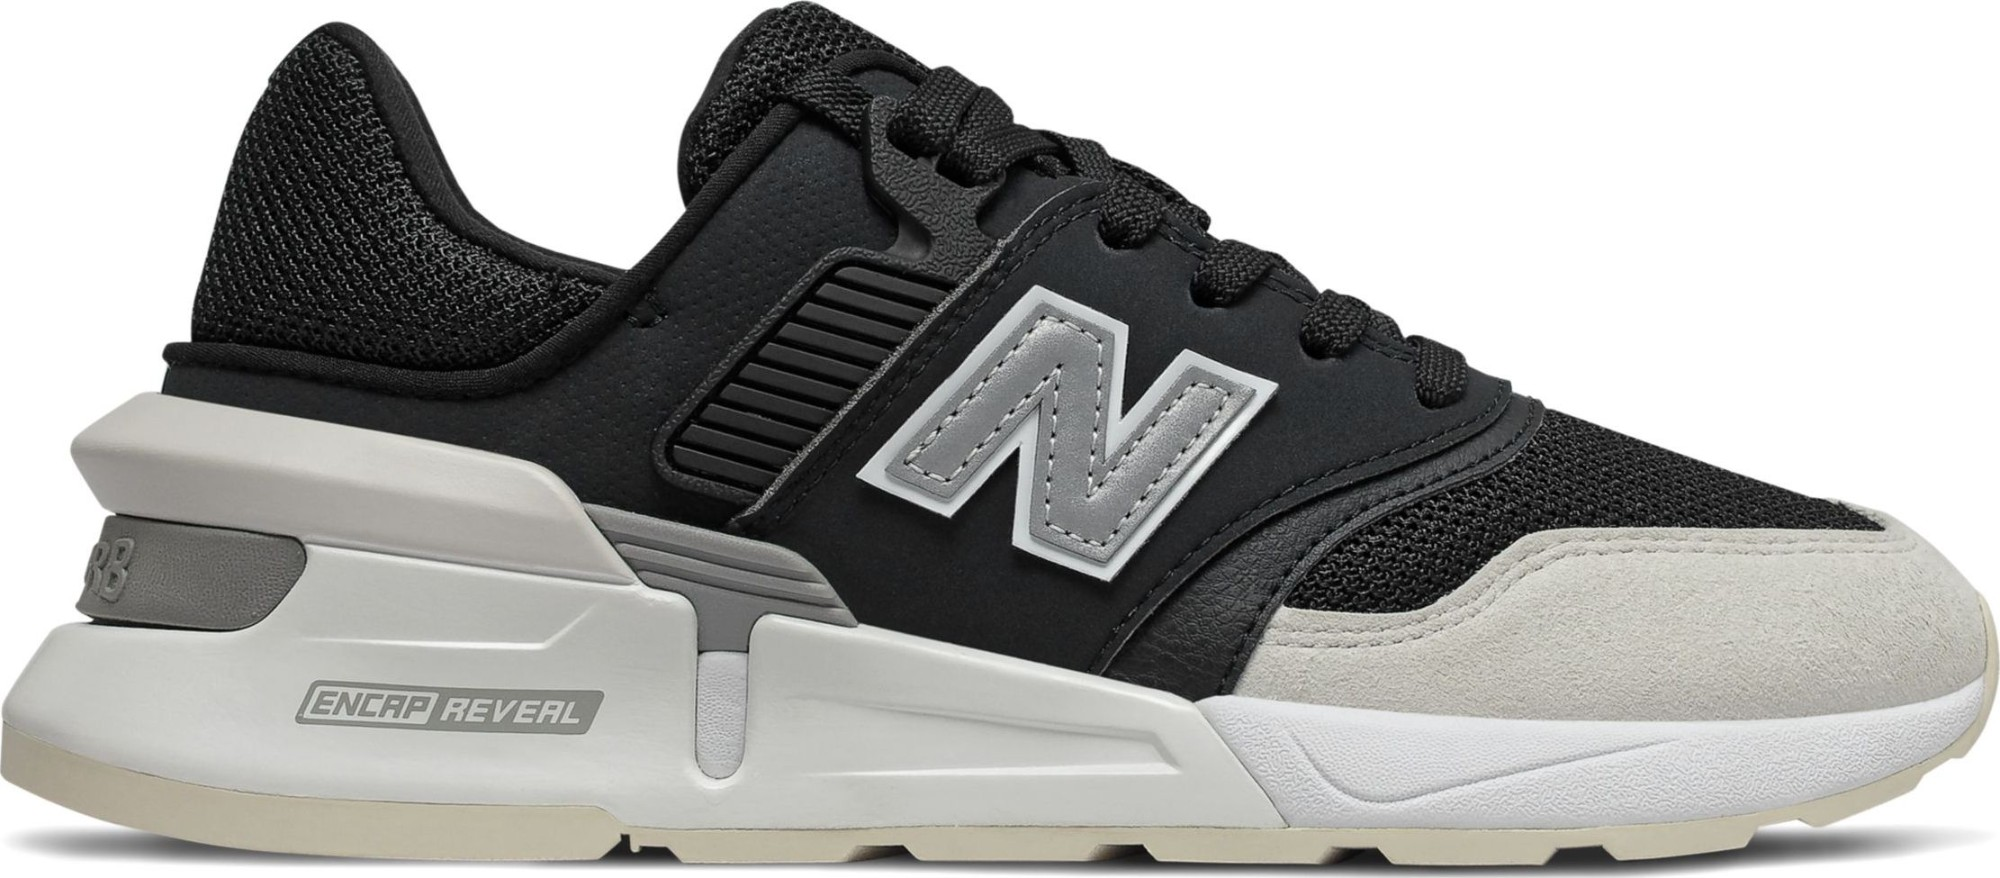 New Balance WS997 Sport Black/Grey 40